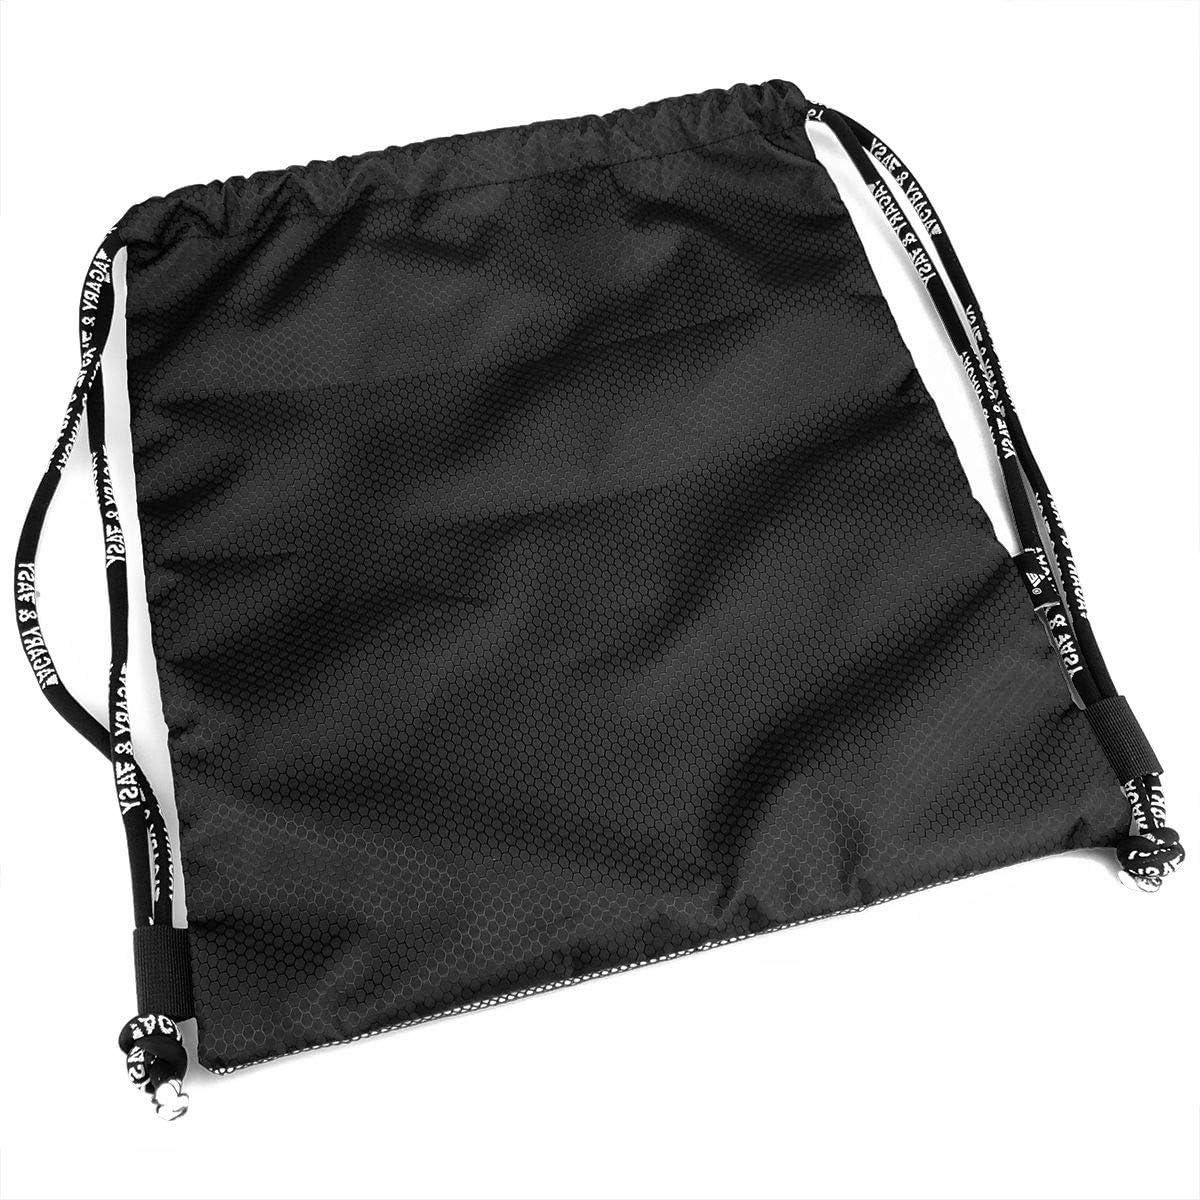 Yackpa Navy Copper Fractal Customized Drawstring Backpack Front Zipper Mesh Bag Unisex For Travel Fitness